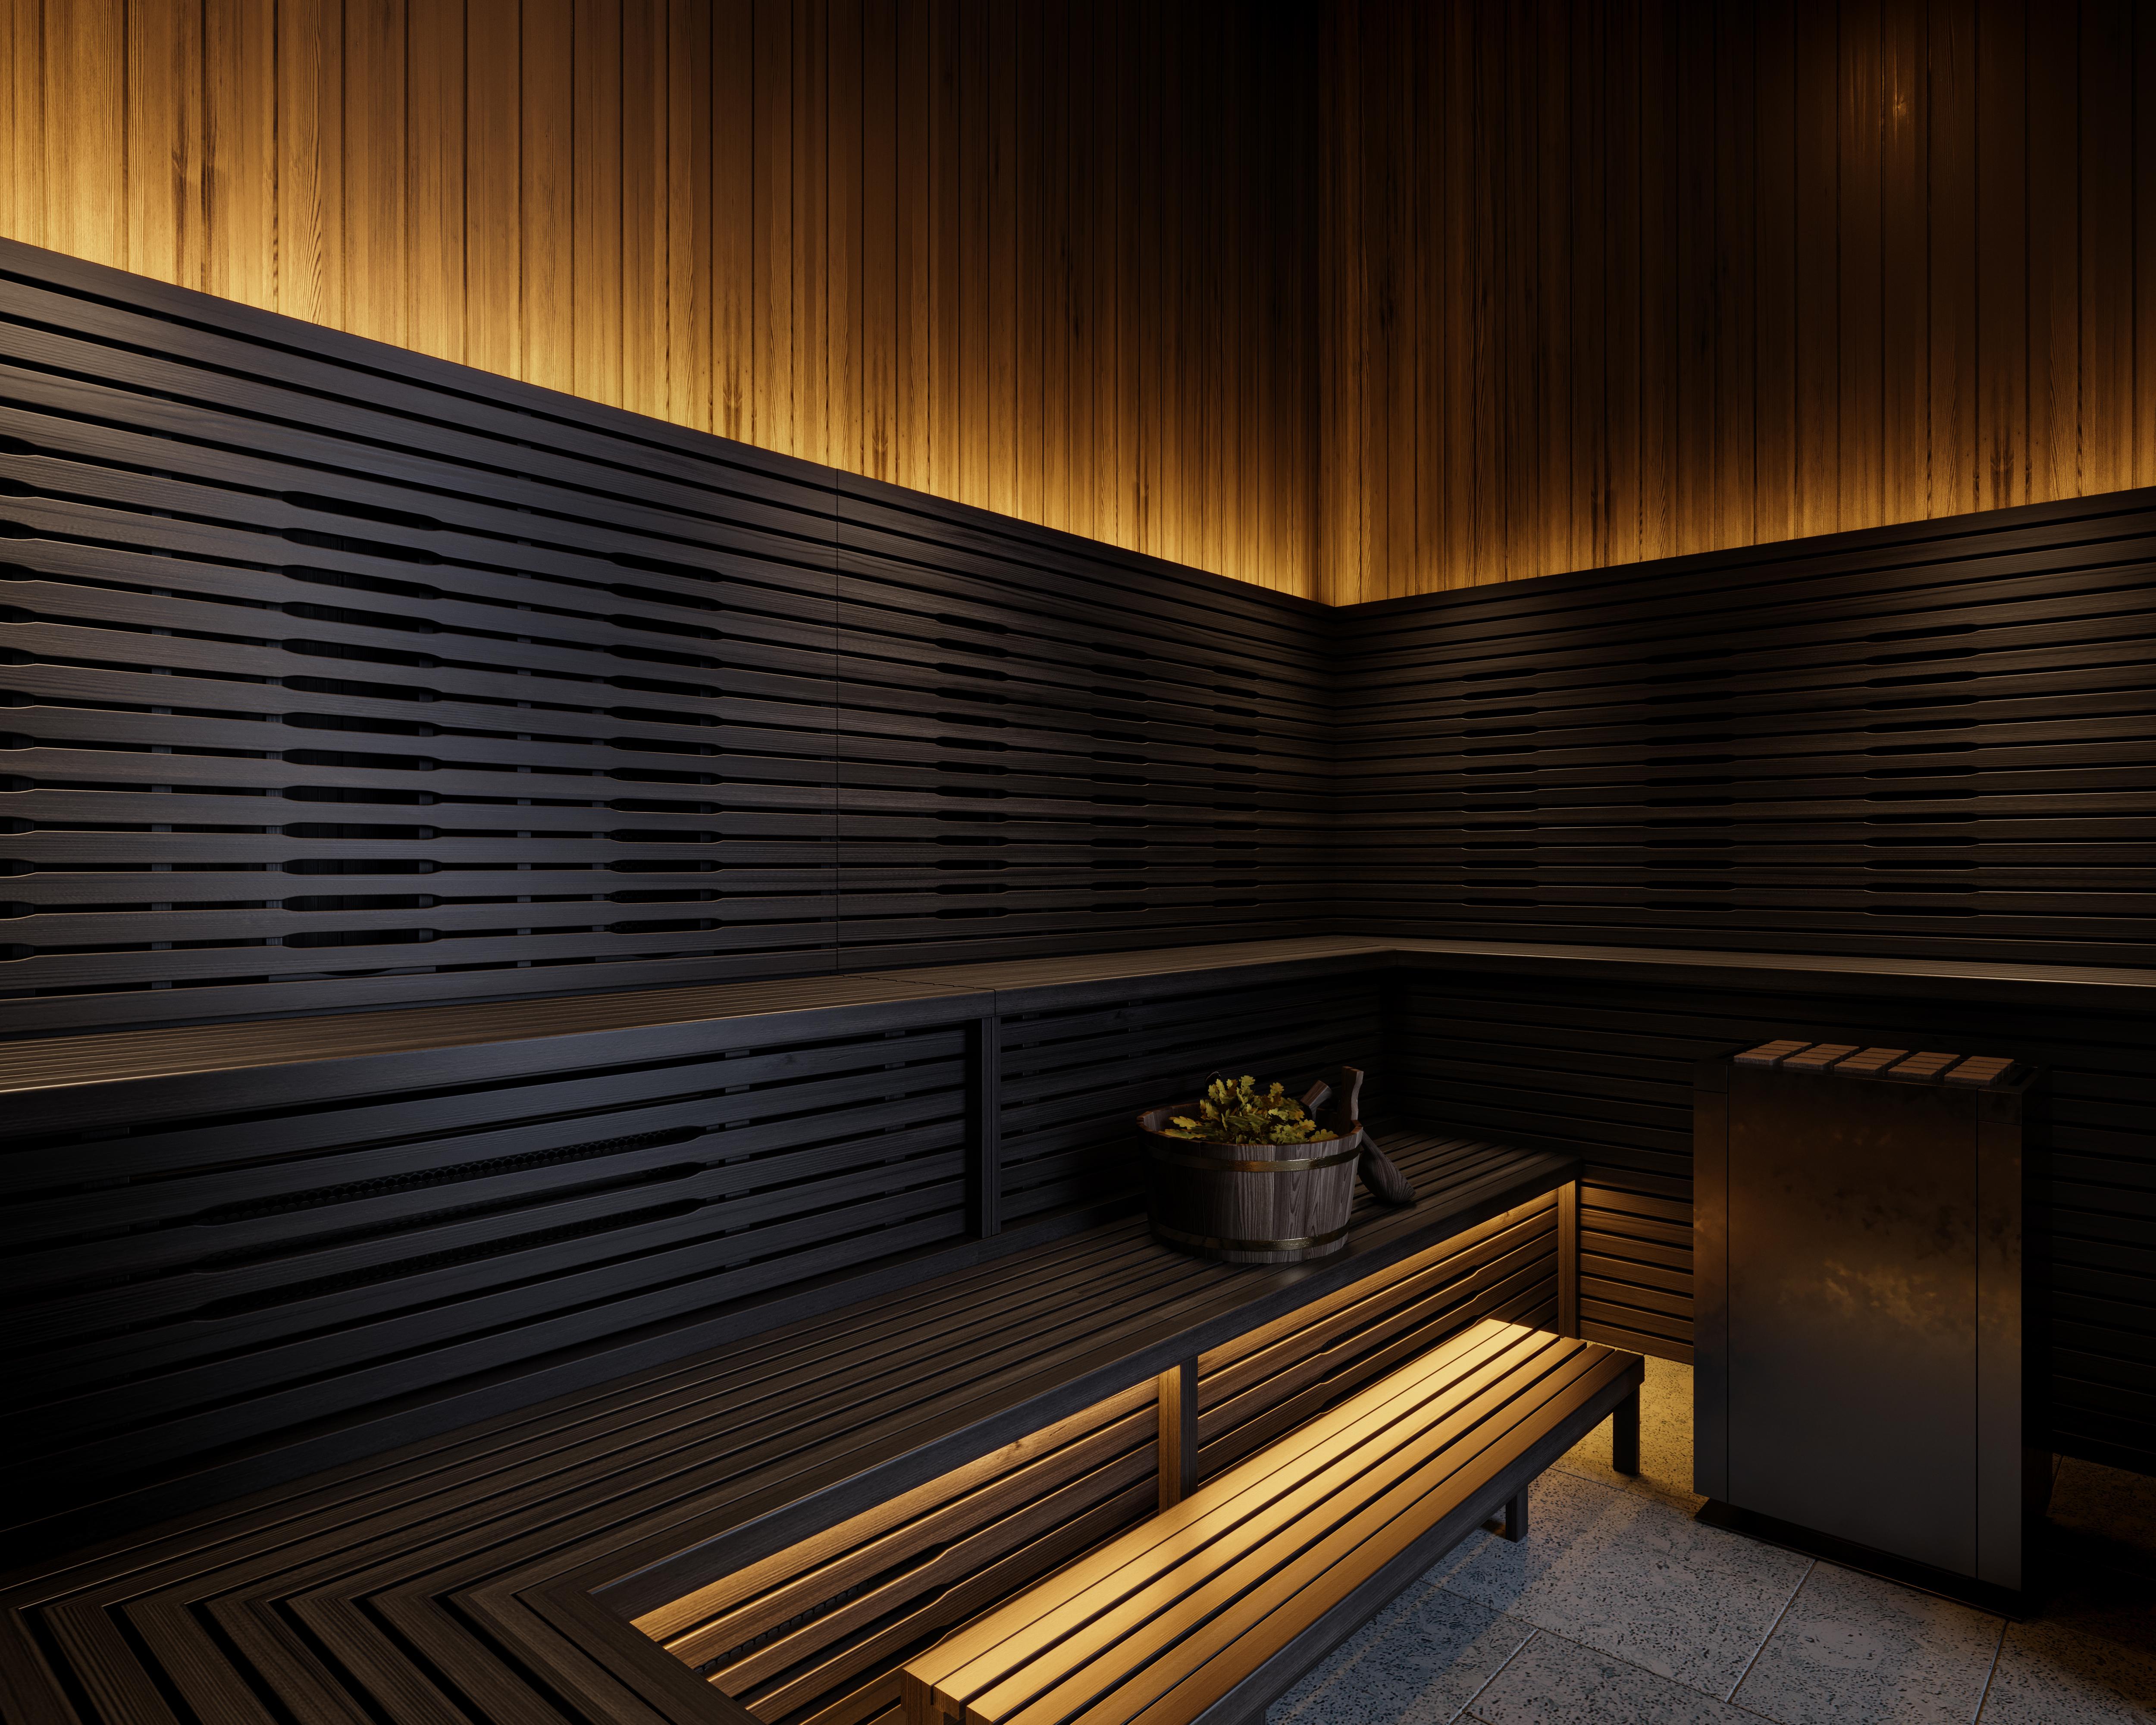 FINAL_Sauna 1.jpg